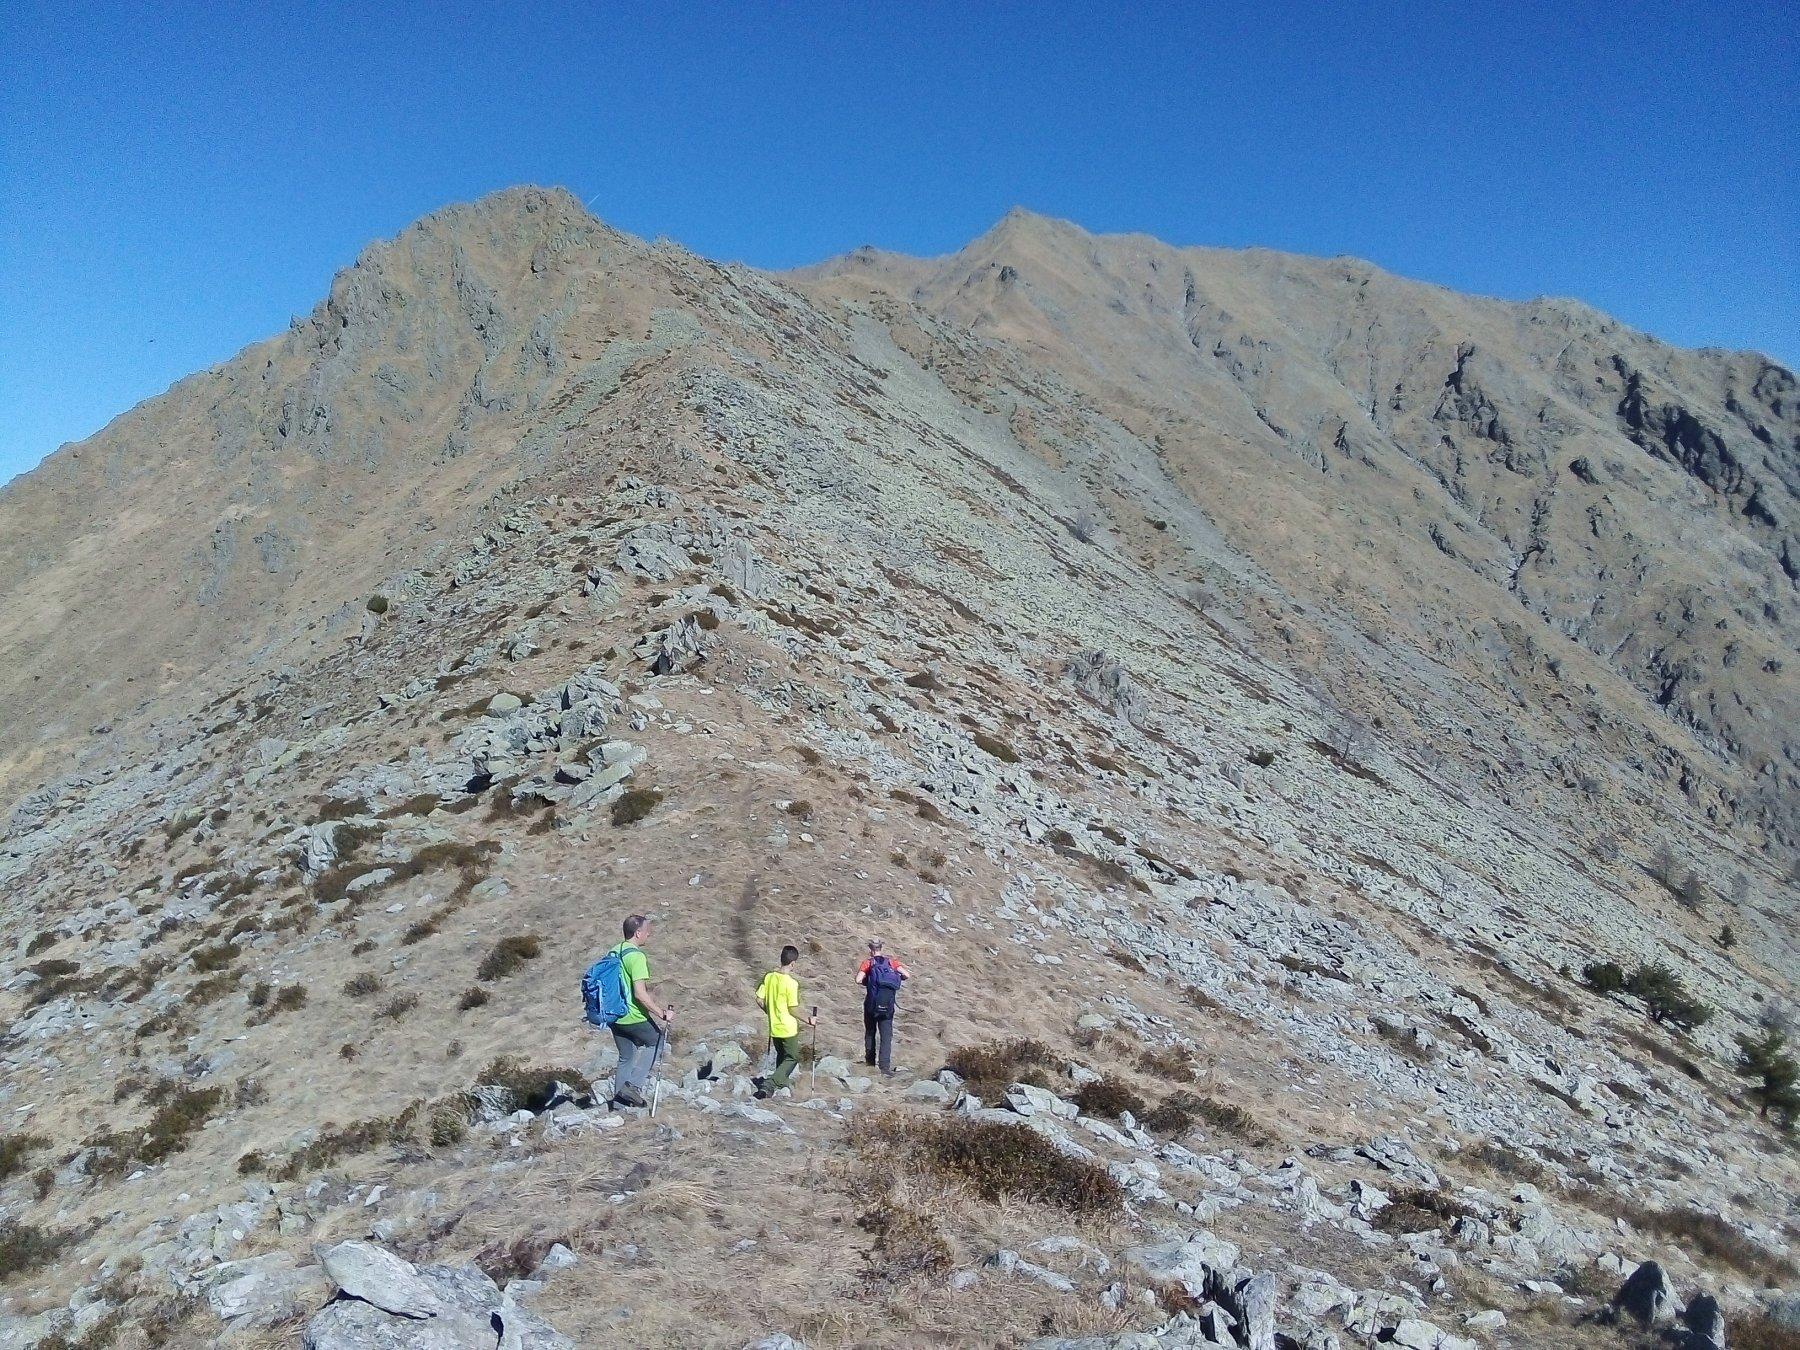 Verso la cima dopo la Costafiorita.